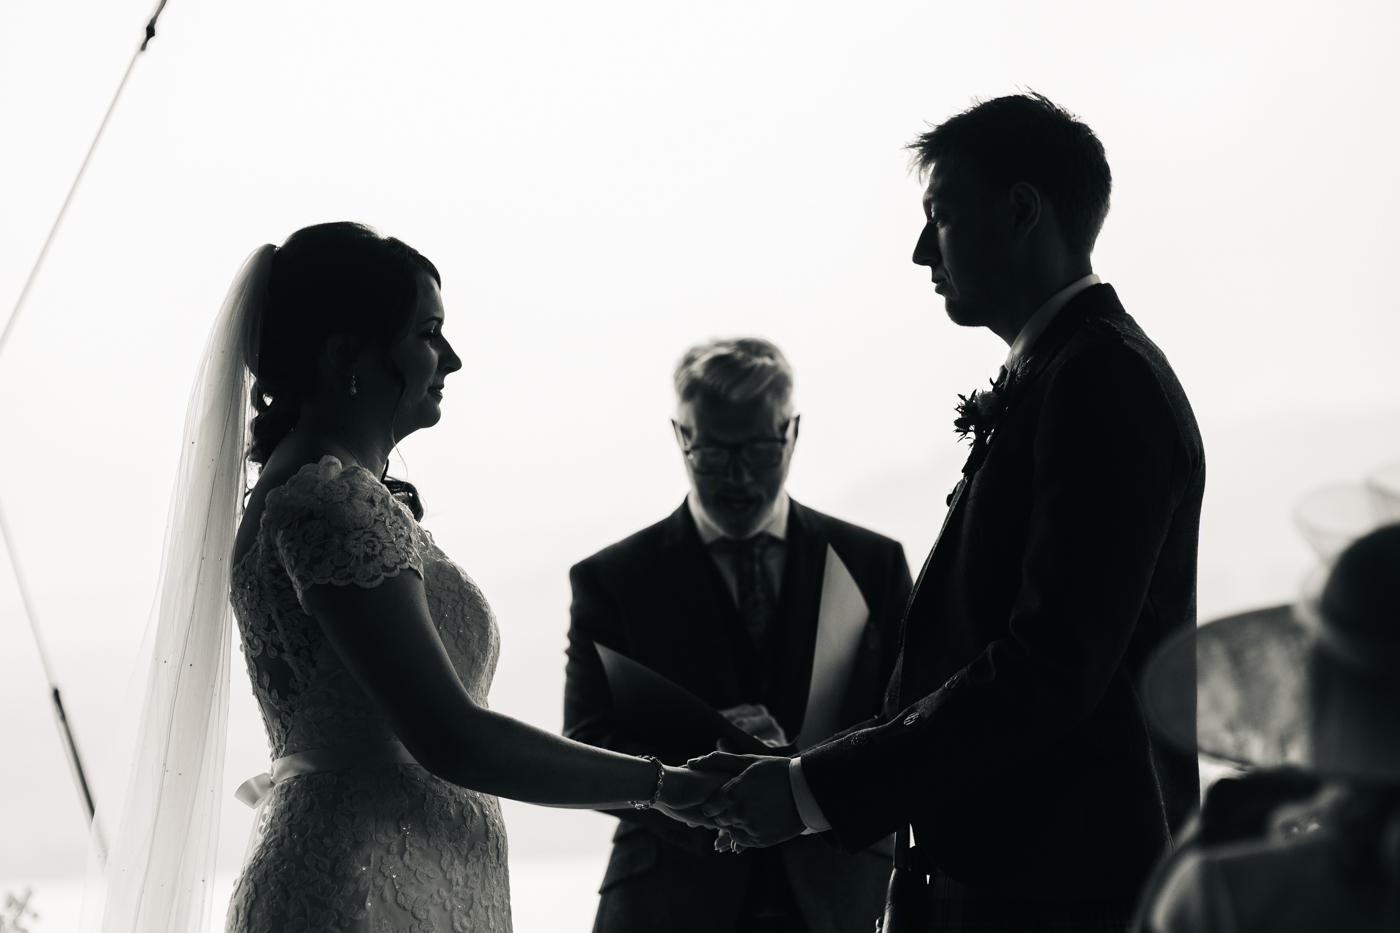 scottish-wedding-trossachs-loch-tay-highlannds-relaxed-photography-photographer-0021.jpg